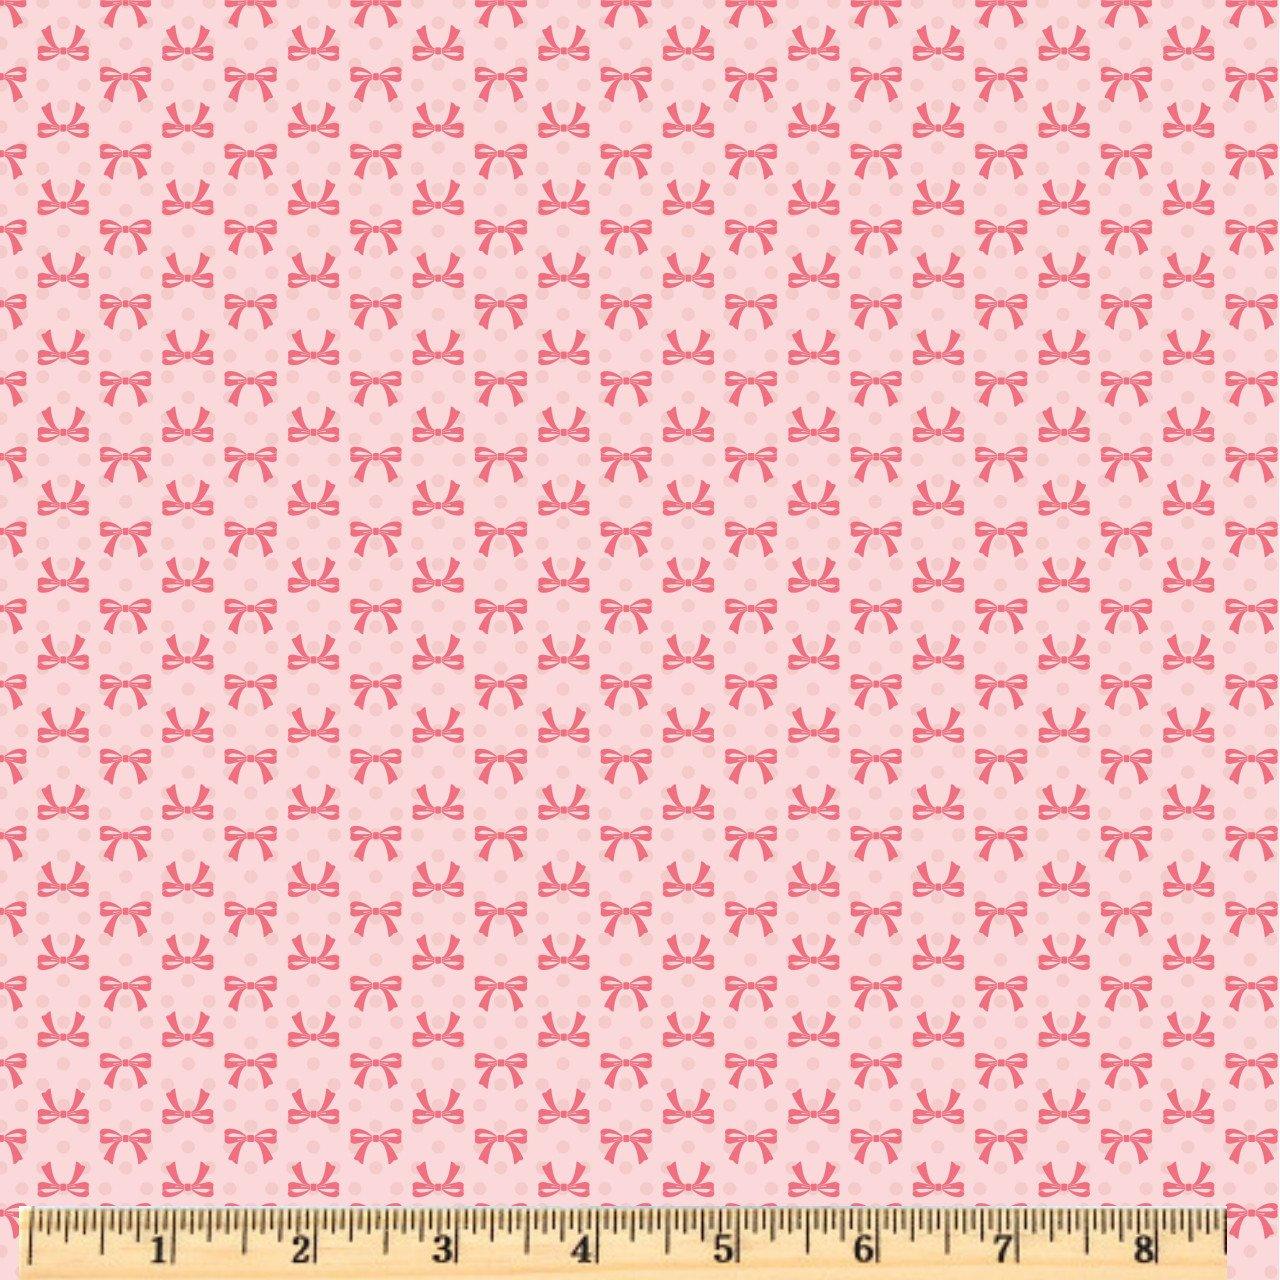 Dots & Posies - Bows - Blush